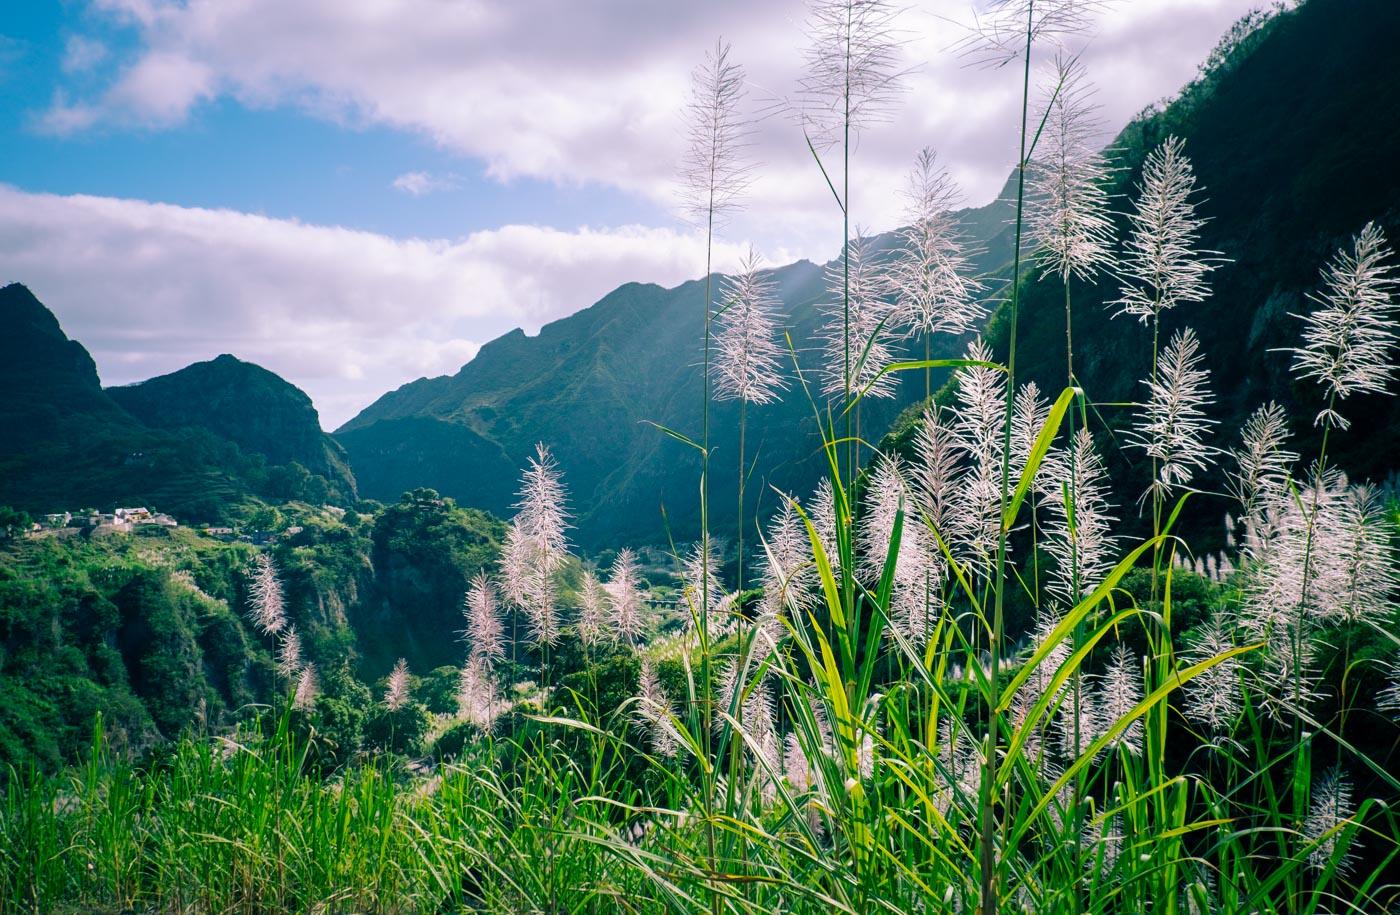 Santo Antão i Kap Verde – sockerrör